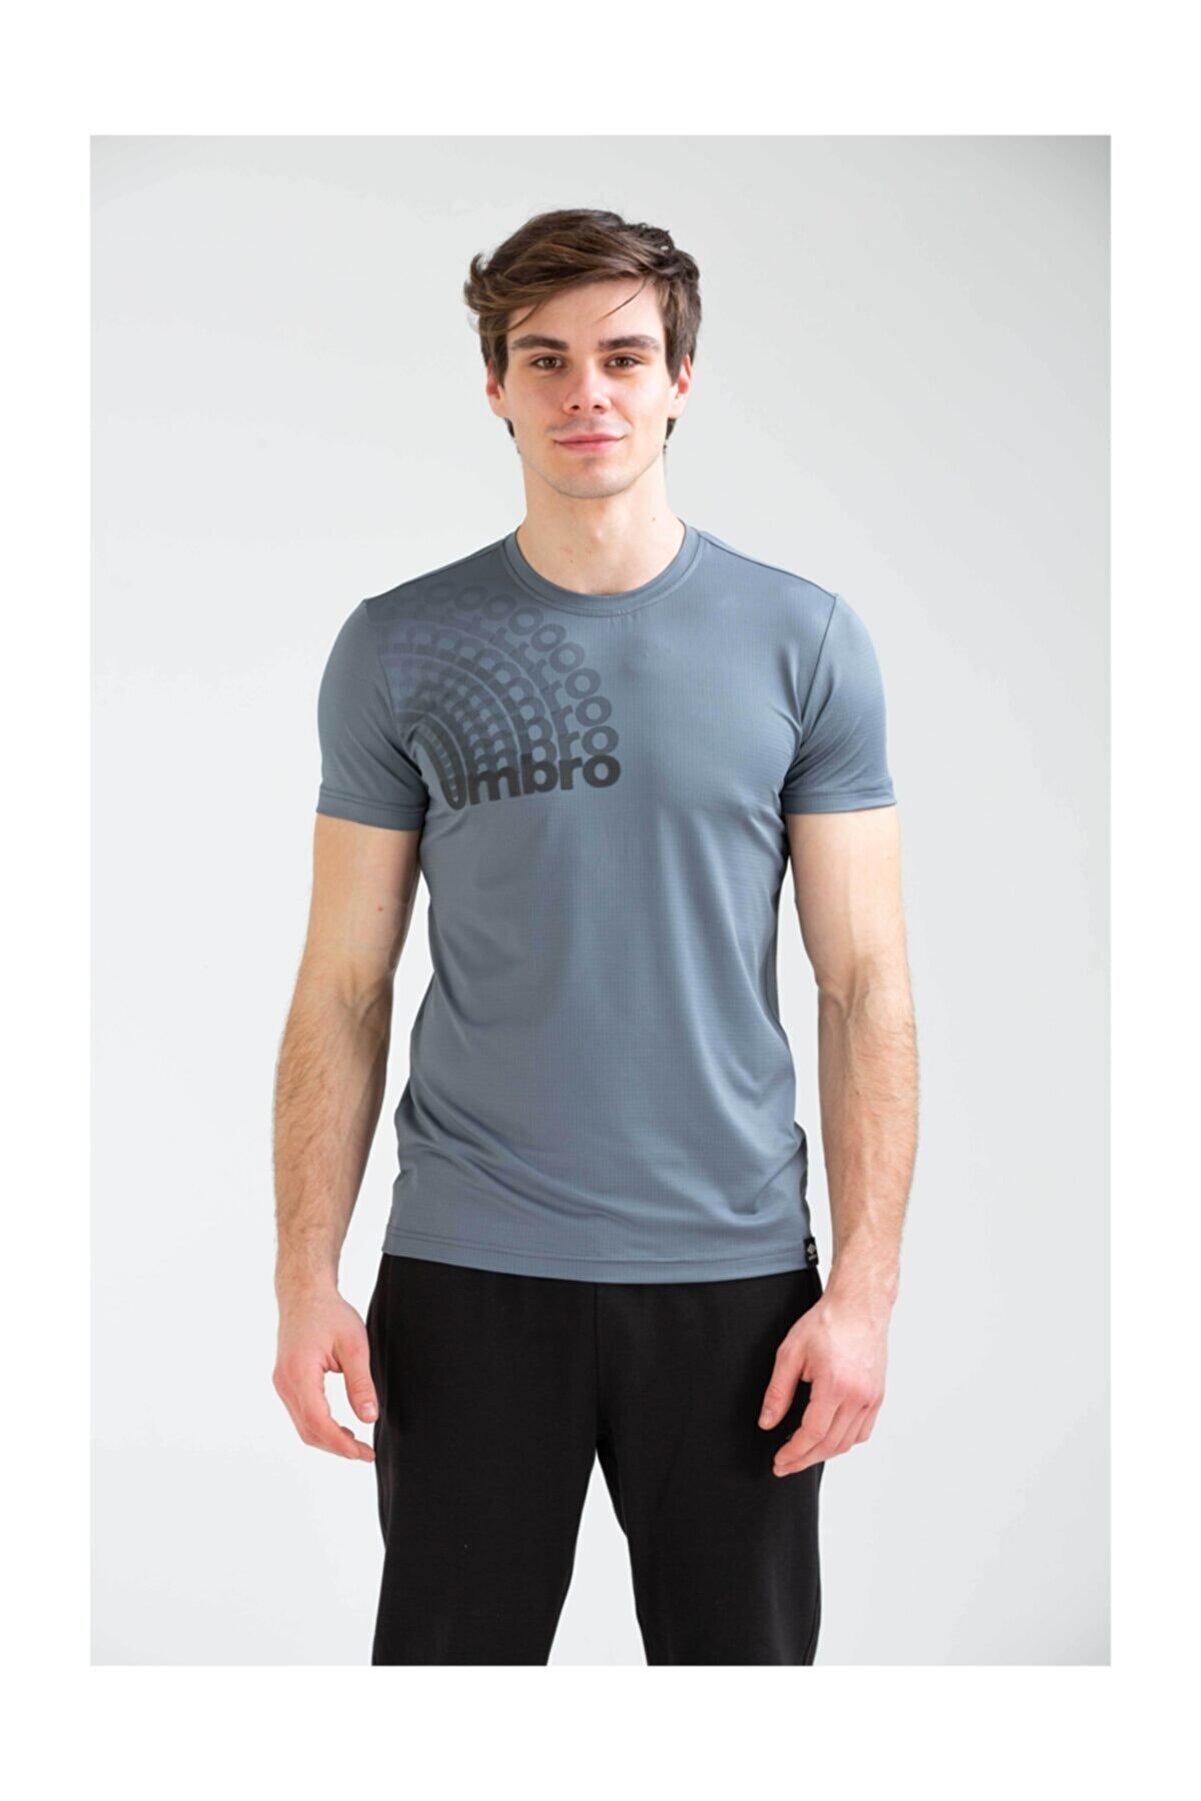 Umbro Erkek T-shirt Tf-0011 Meyr Tshirt